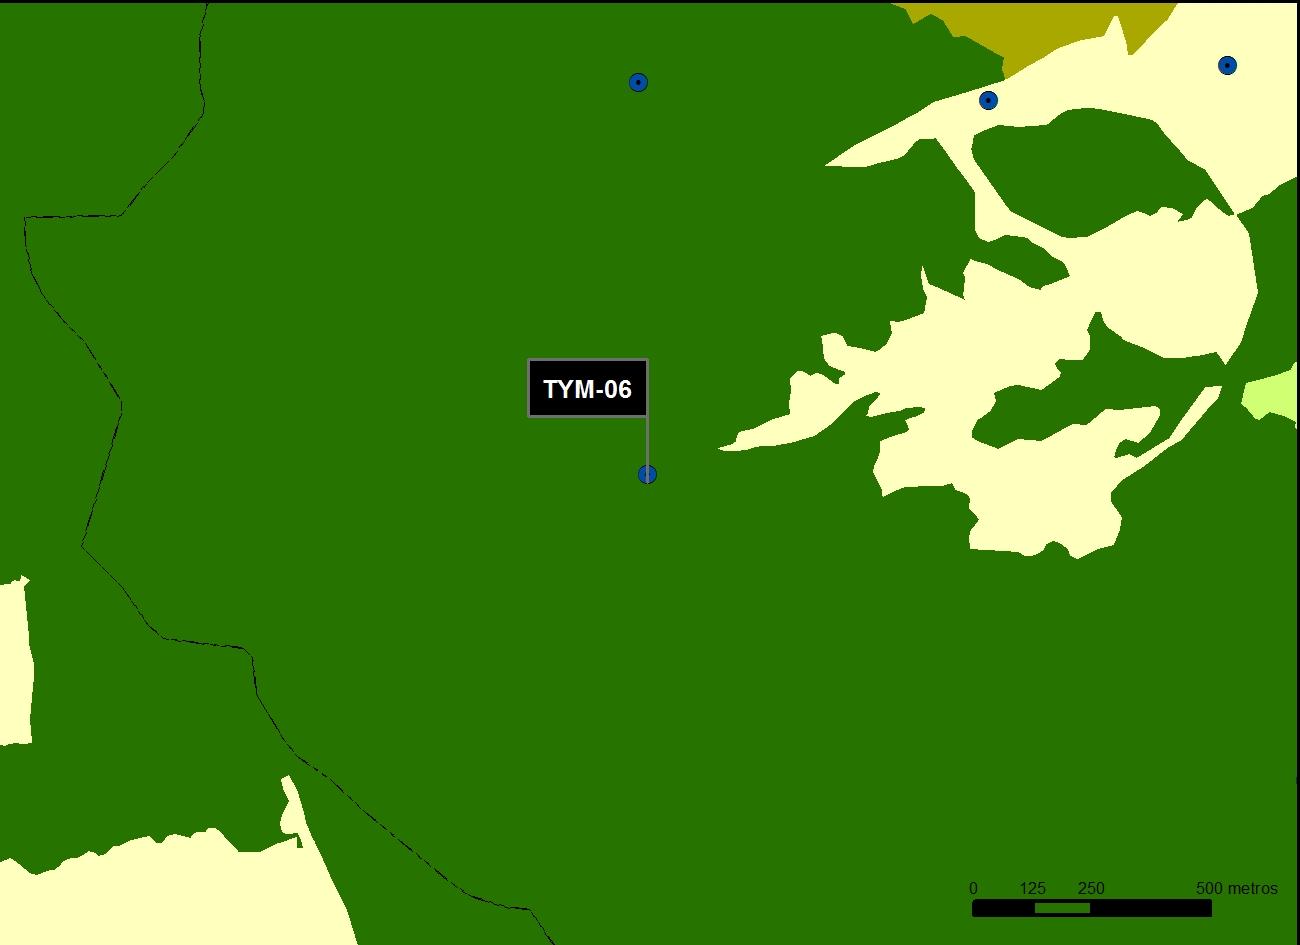 TYM_06_M.V.LOZANO_SAN PEDRO_MAP.VEG